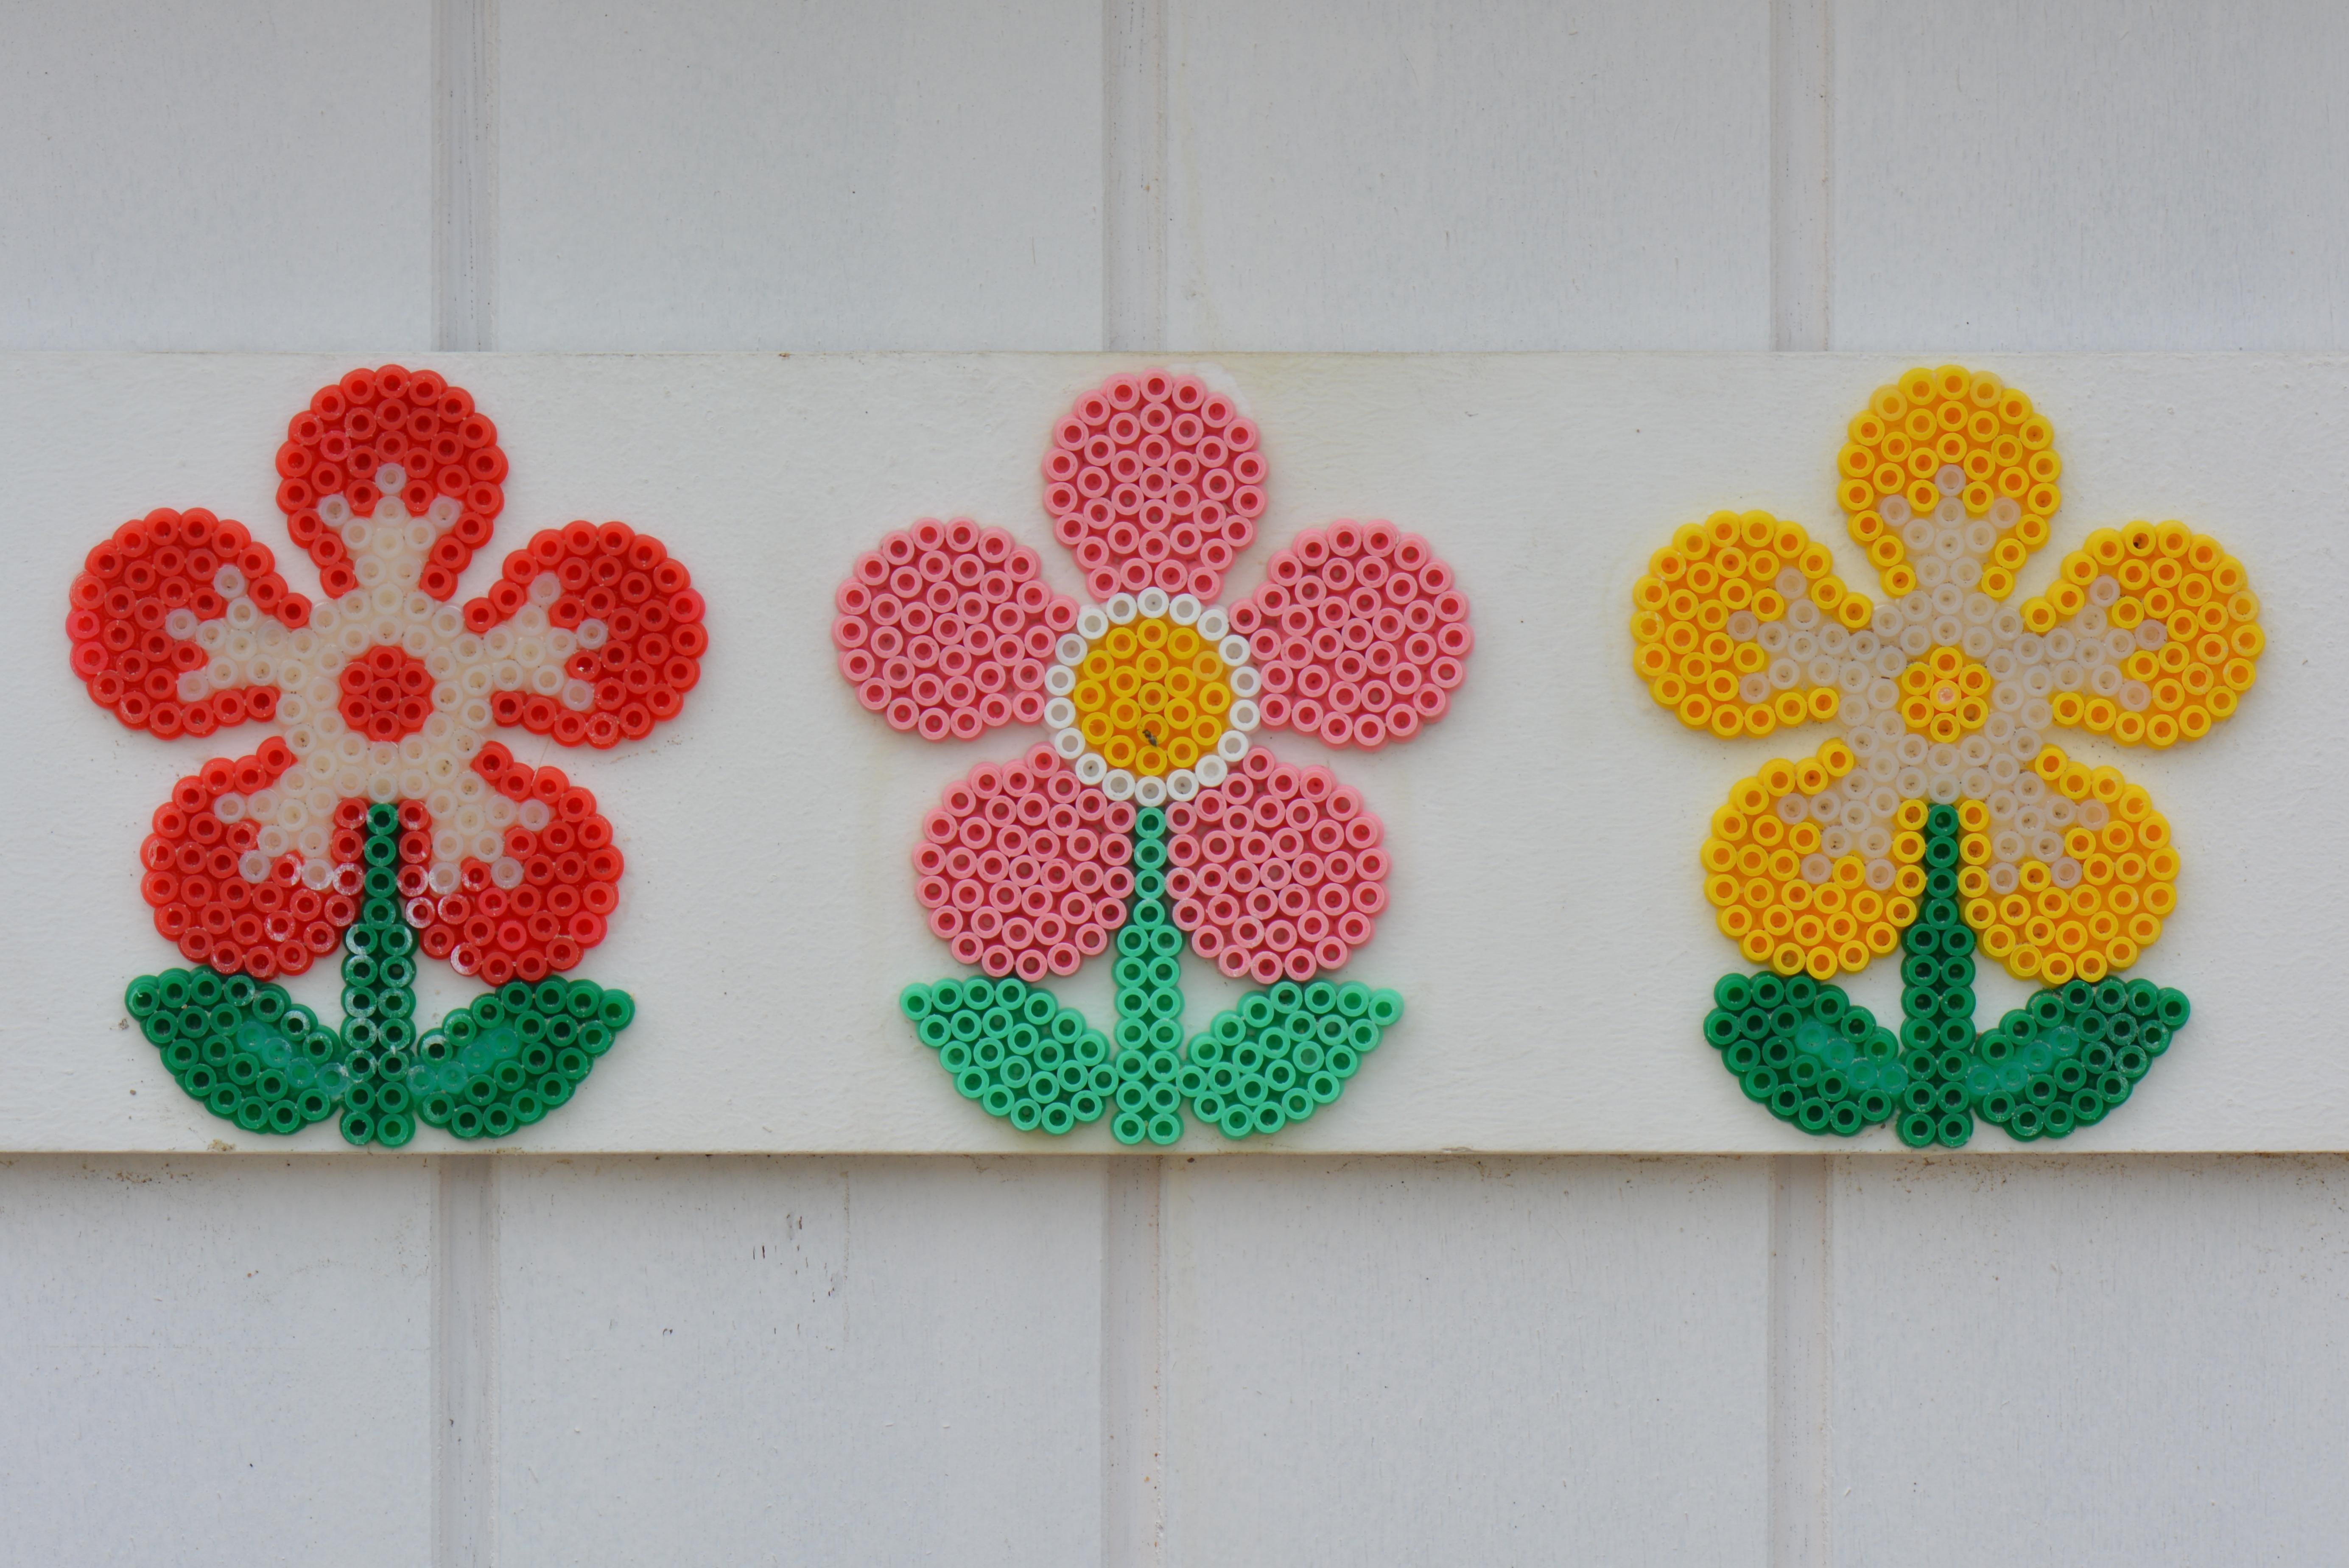 Kostenlose foto : Pflanze, Blume, Blütenblatt, Dekoration, Muster ...